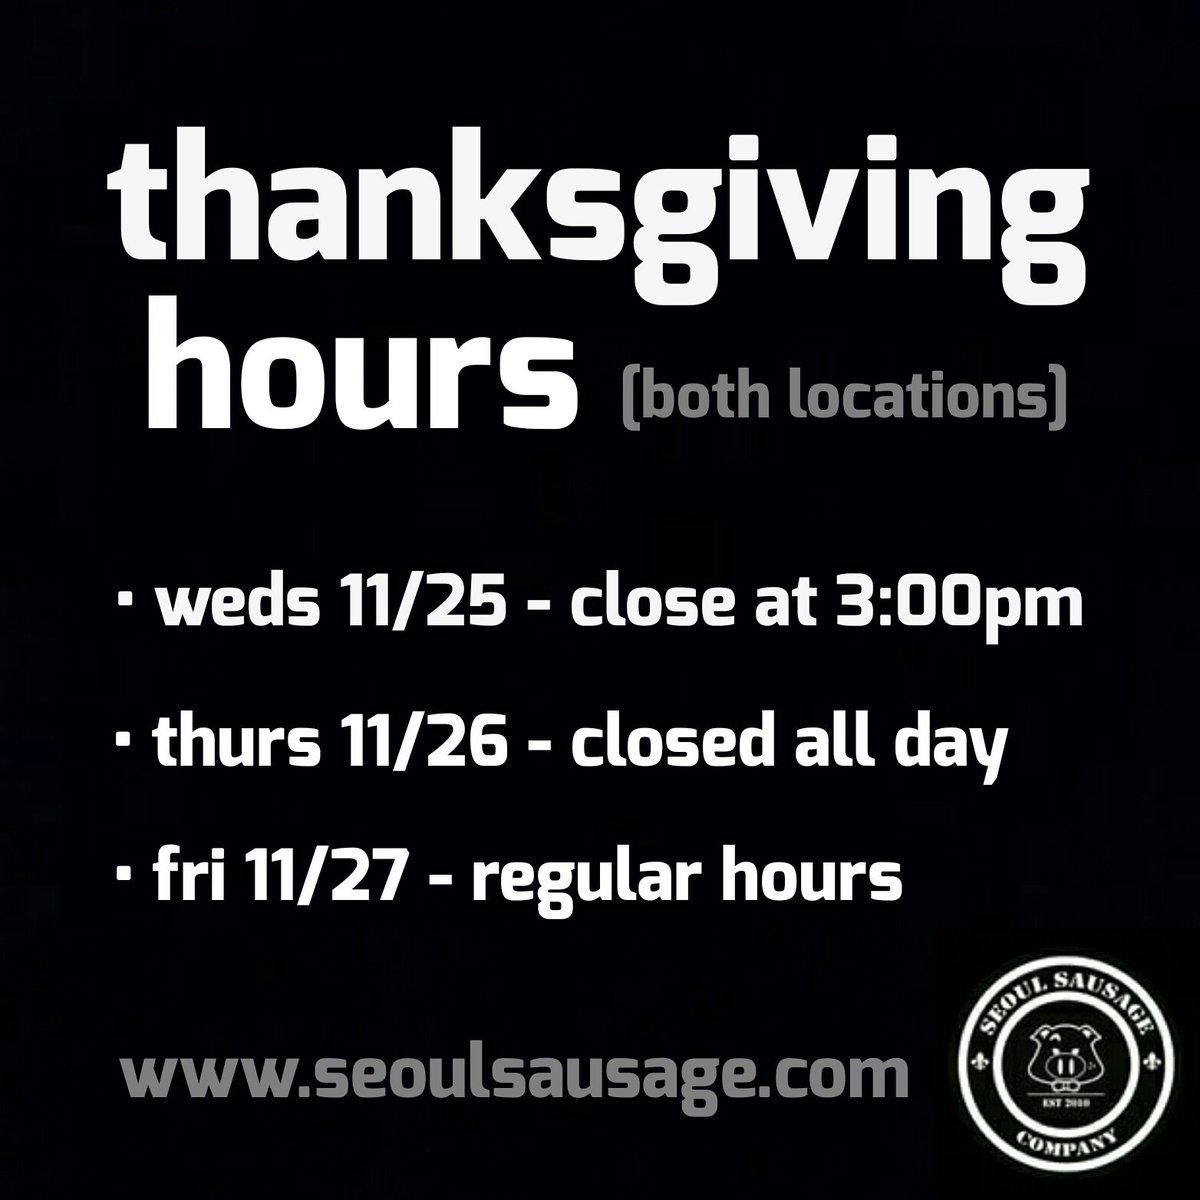 #Thanksgiving hours: https://t.co/XaZgiSKzIC